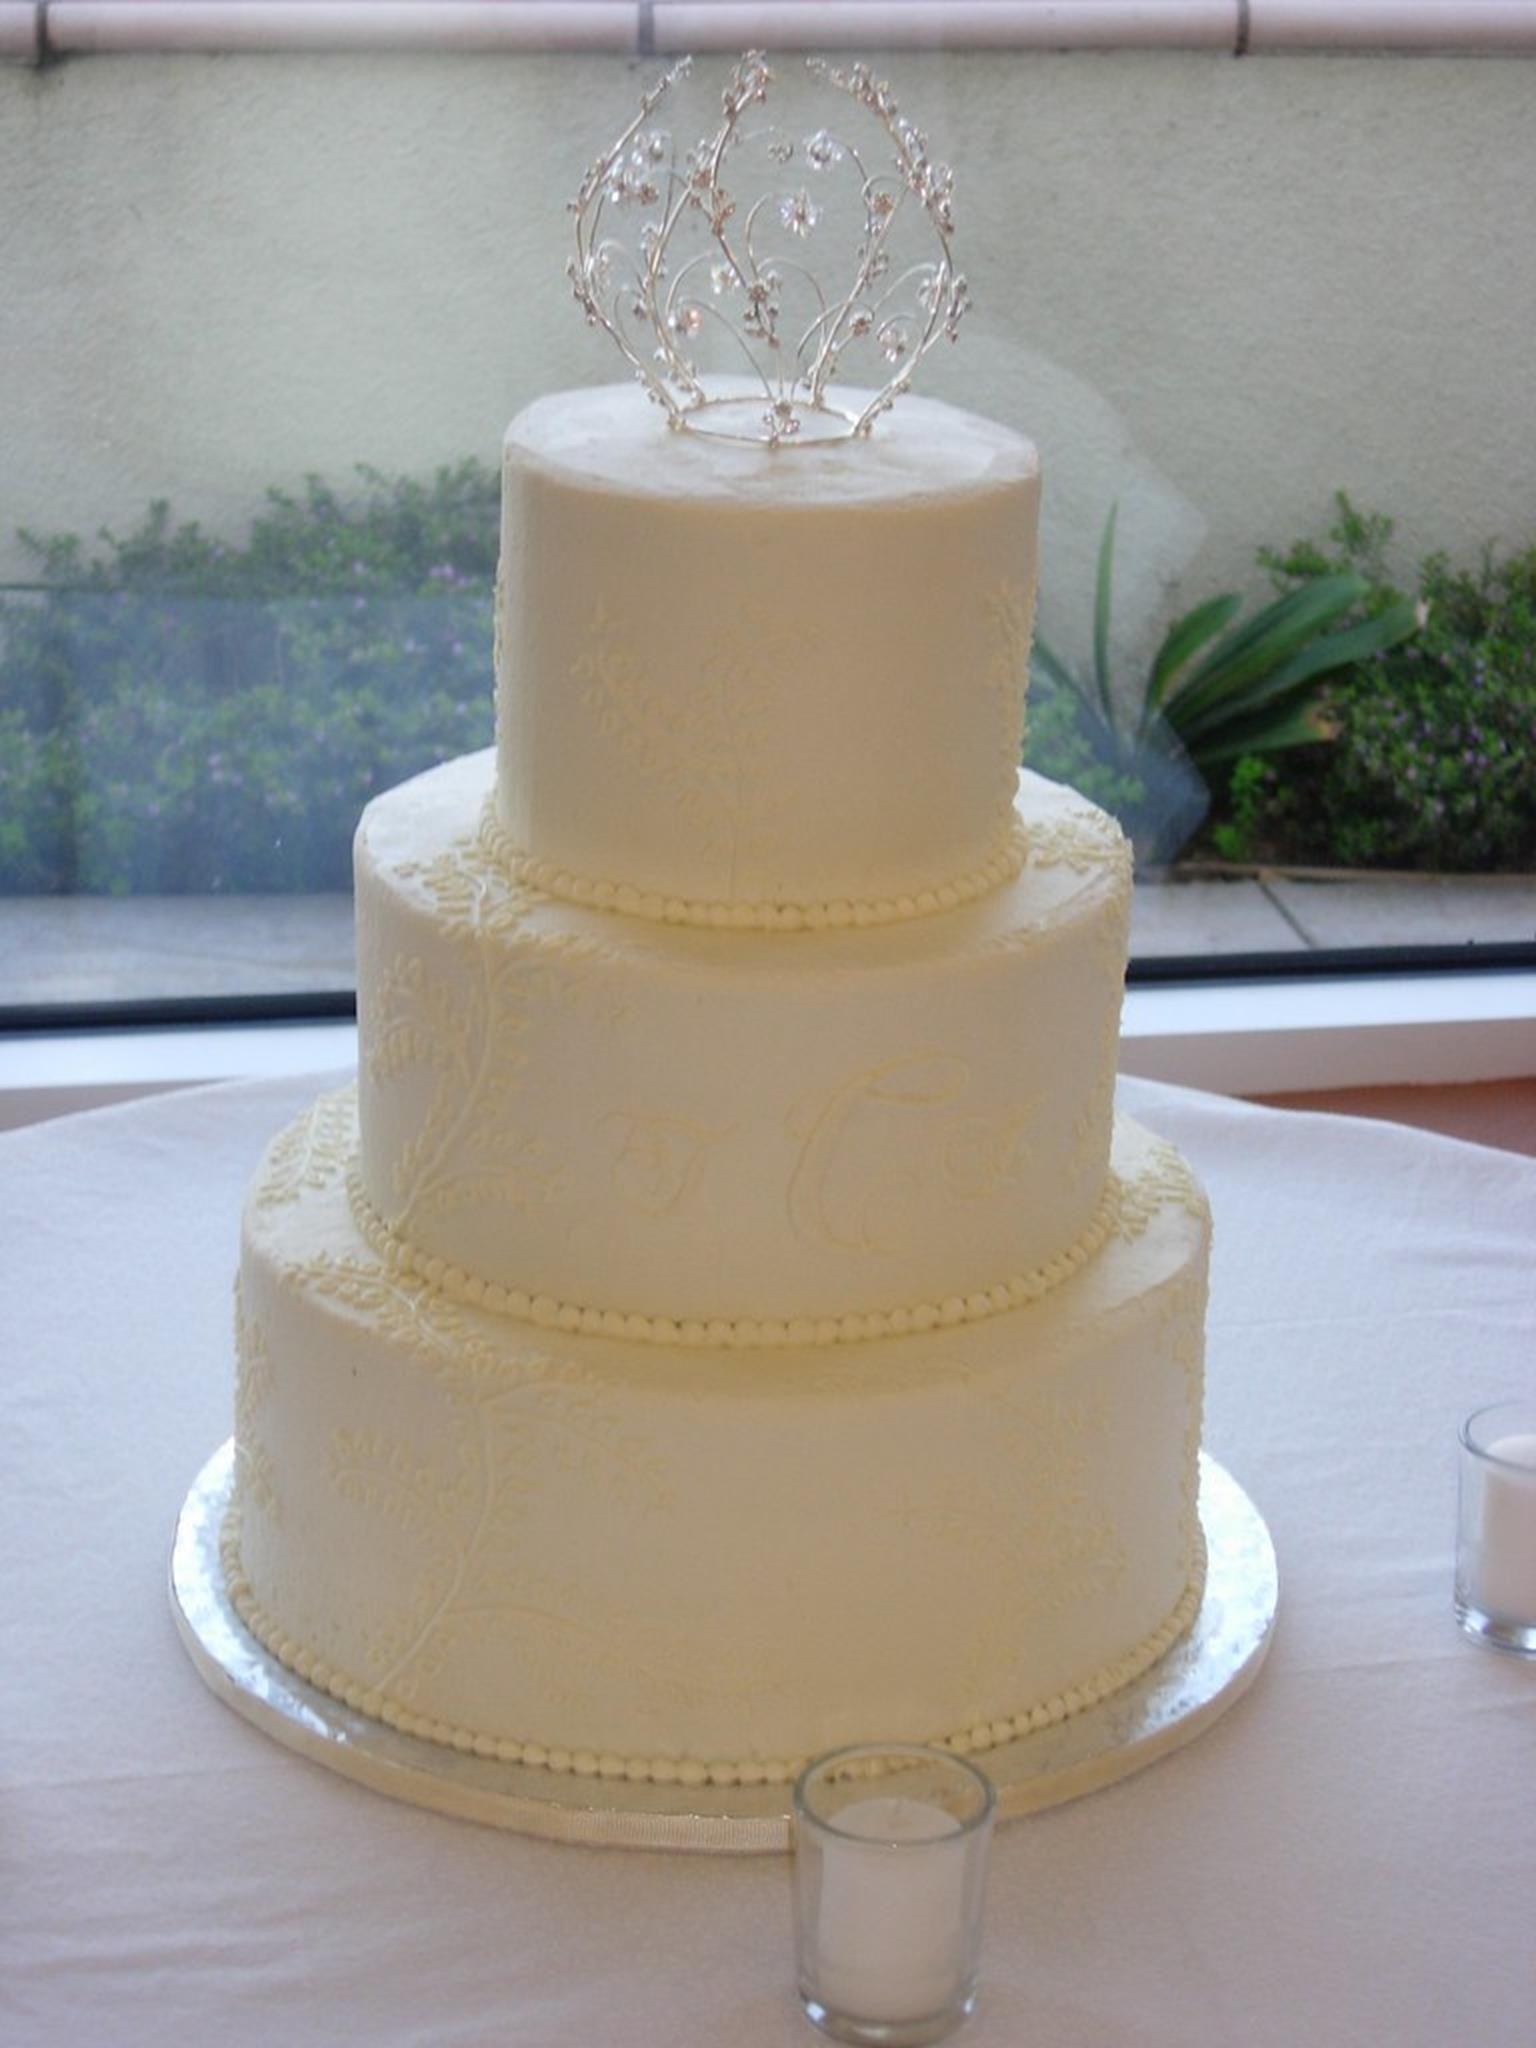 Wedding Cake Makers Near Me In 2020 Modern Wedding Cake Wedding Cake Prices Wedding Cake Maker